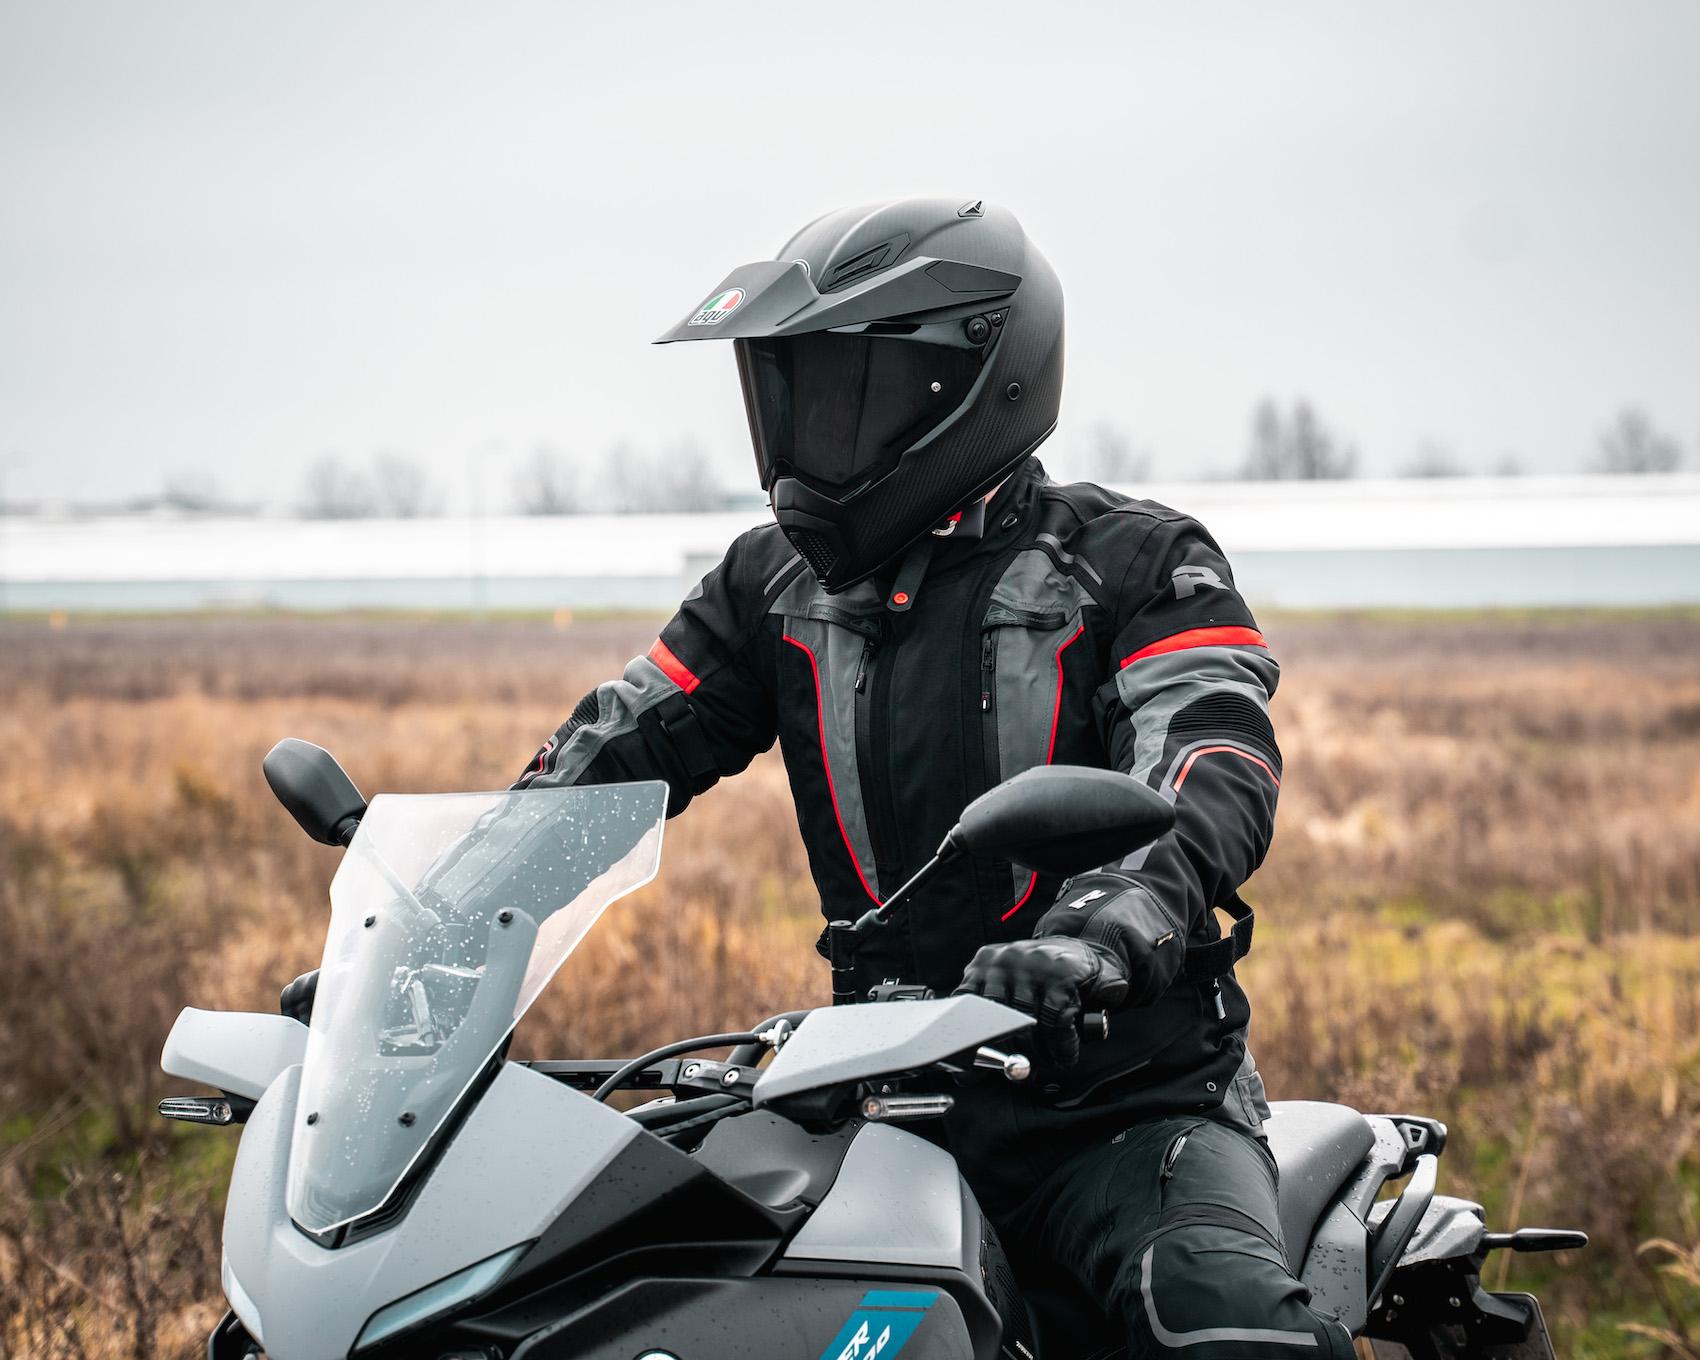 Gelamineerde motorkleding